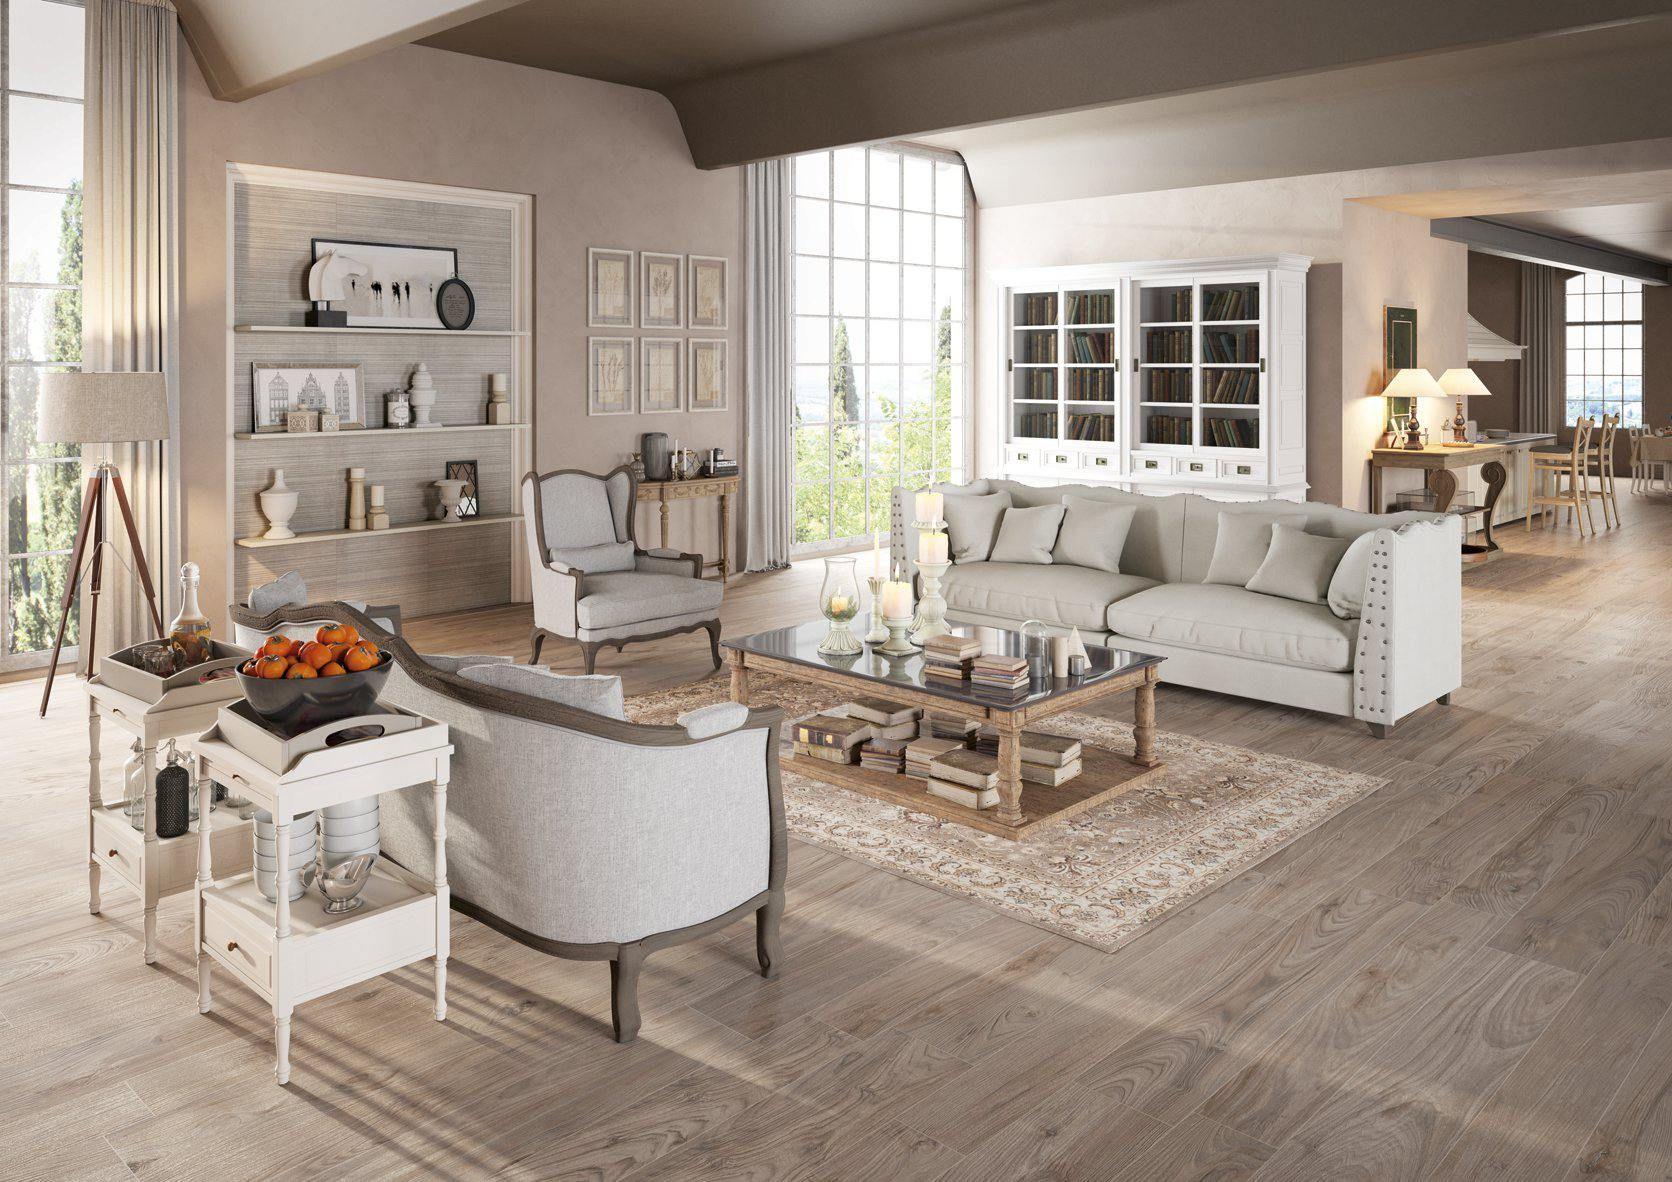 Piastrelle cucina vintage ebay piastrelle pavimento rivestimento